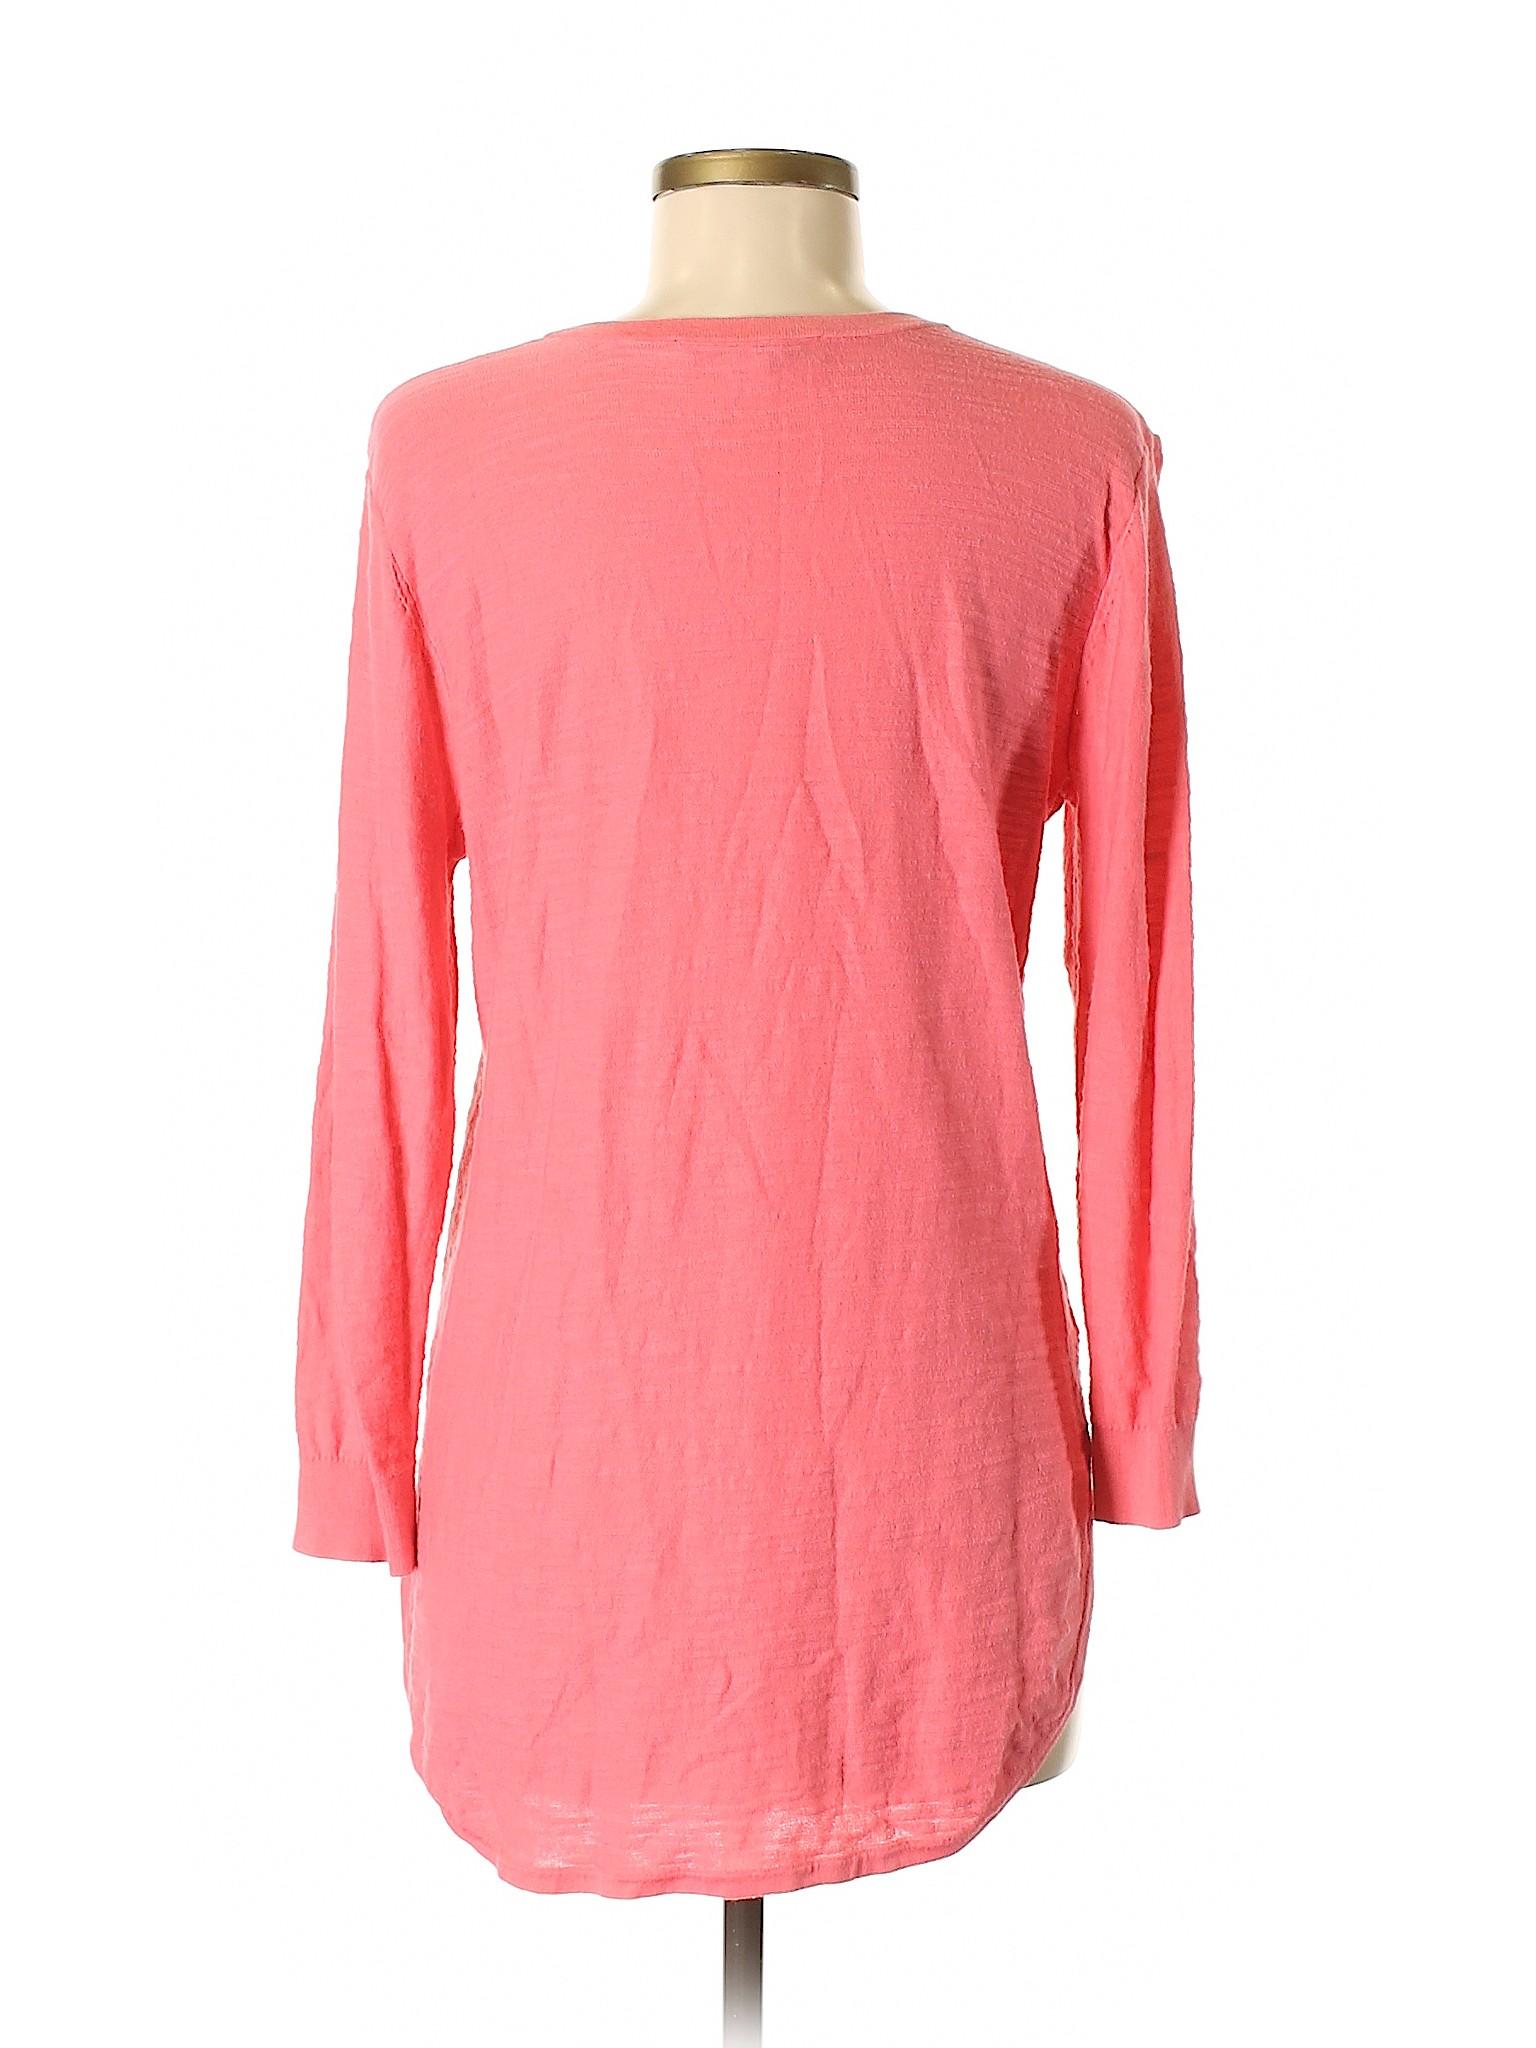 Ann Loft Boutique Sweater Pullover Winter Taylor 5vwxwOqY